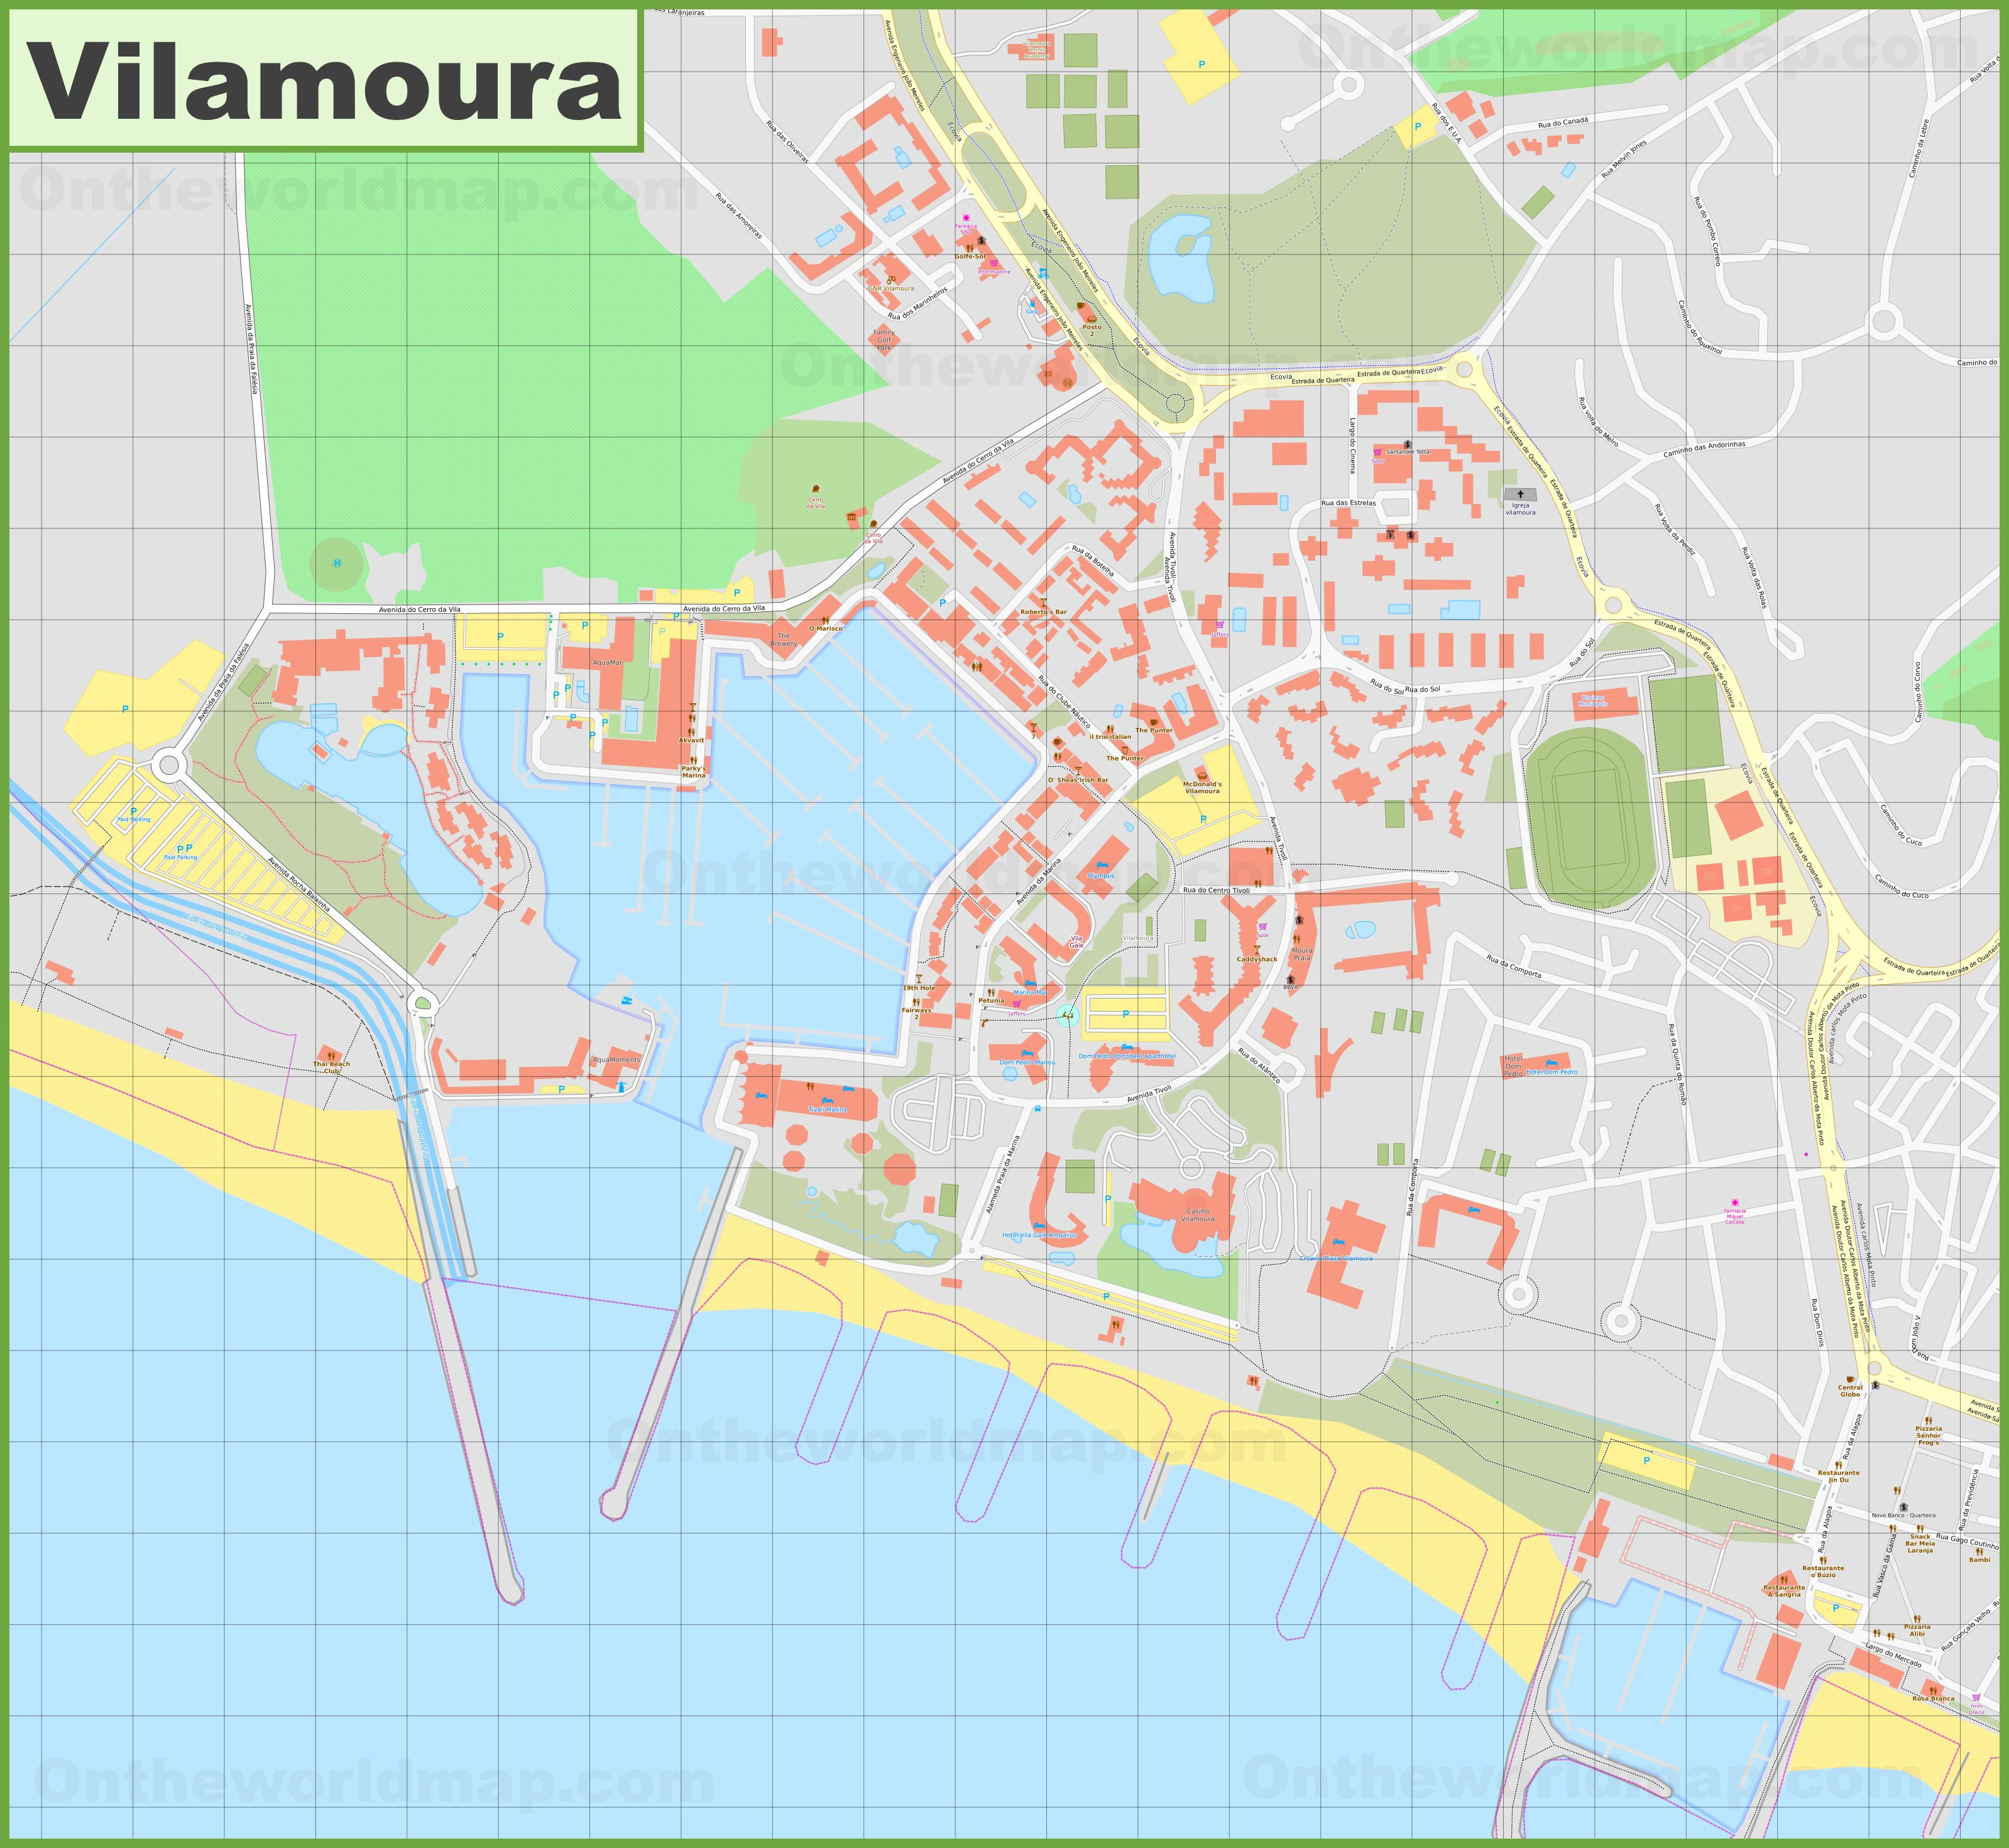 Detailed Map Of Vilamoura